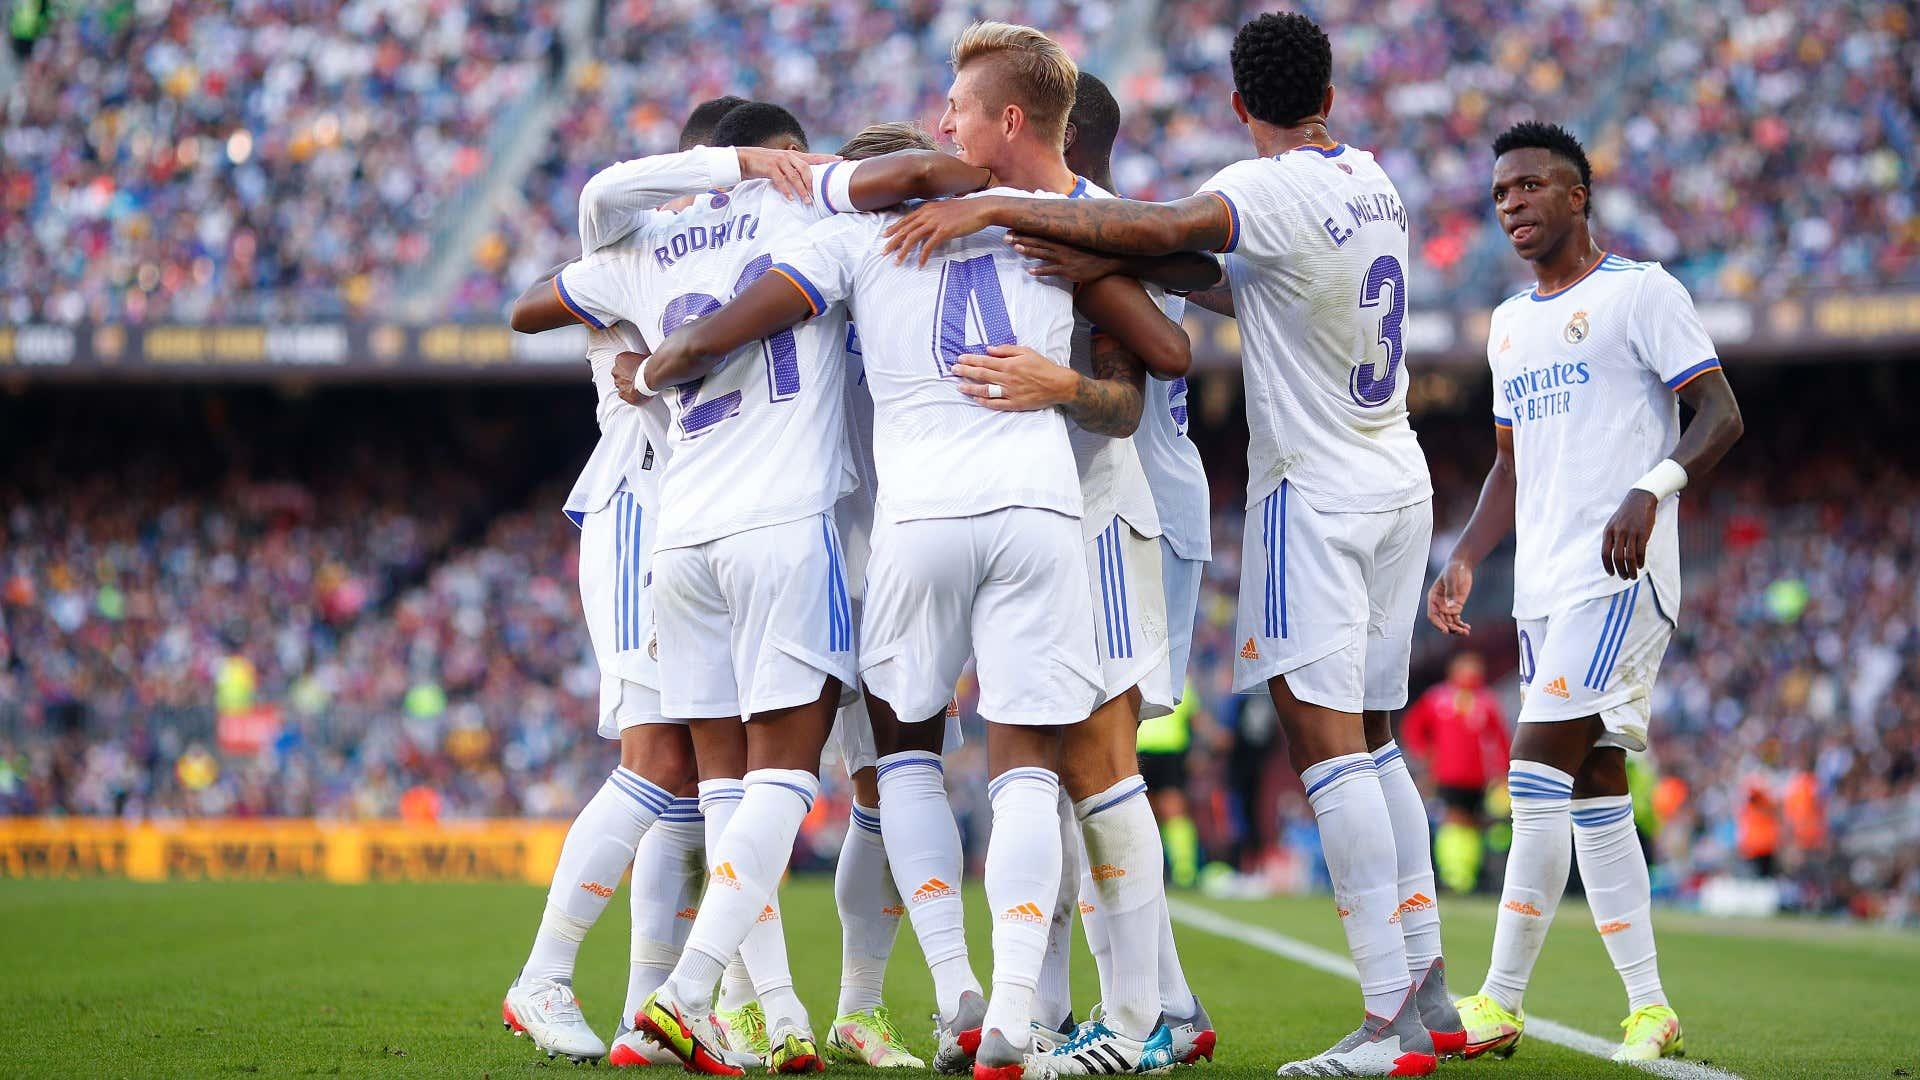 Real Madrid seal best Clasico run since 1965 as Koeman makes unwanted Barcelona history | Goal.com